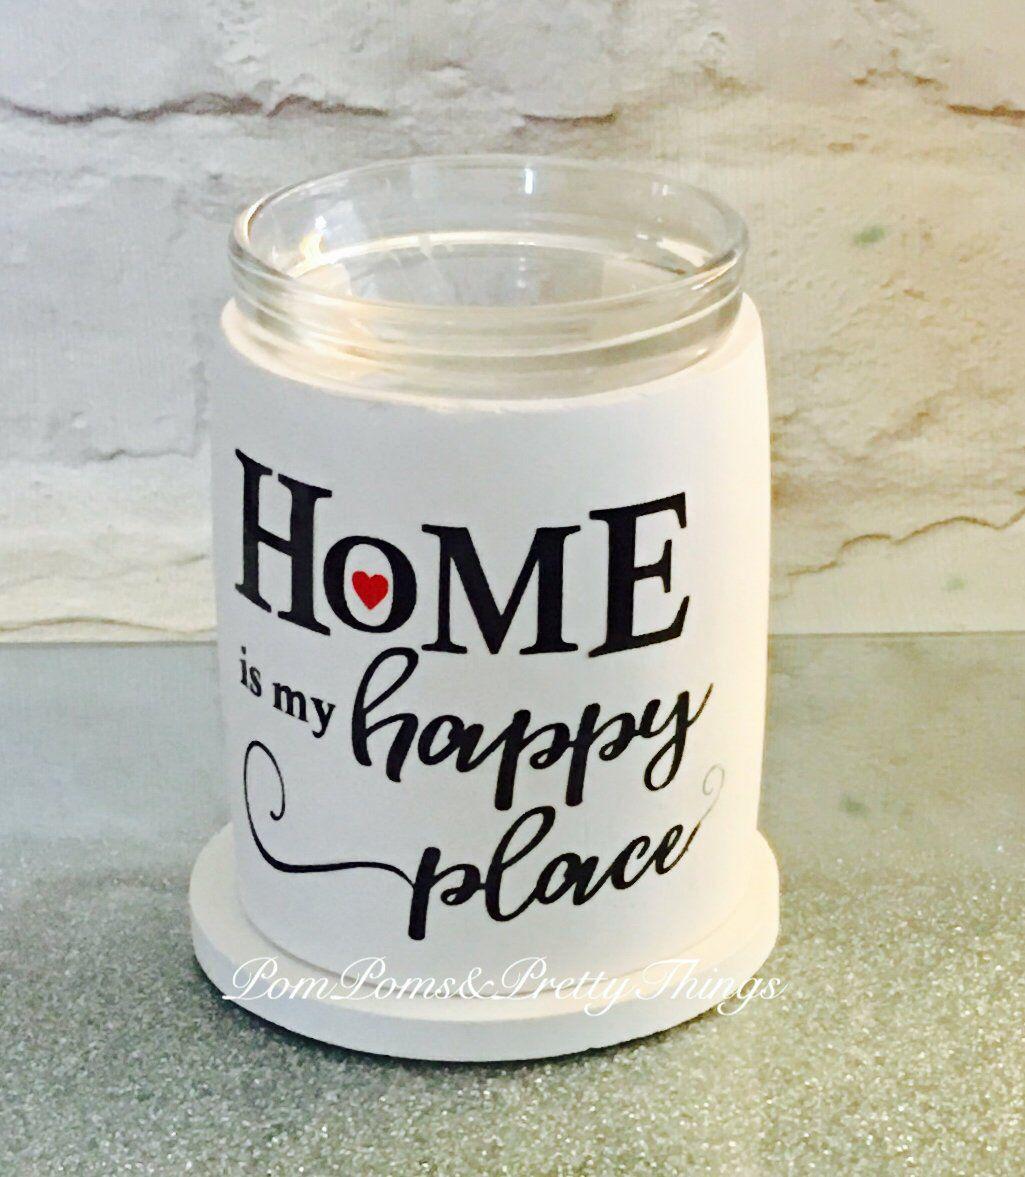 Wax Melts Brander.Home Is My Happy Place Wax Burner Home Wax Melt Burner Scented Wax